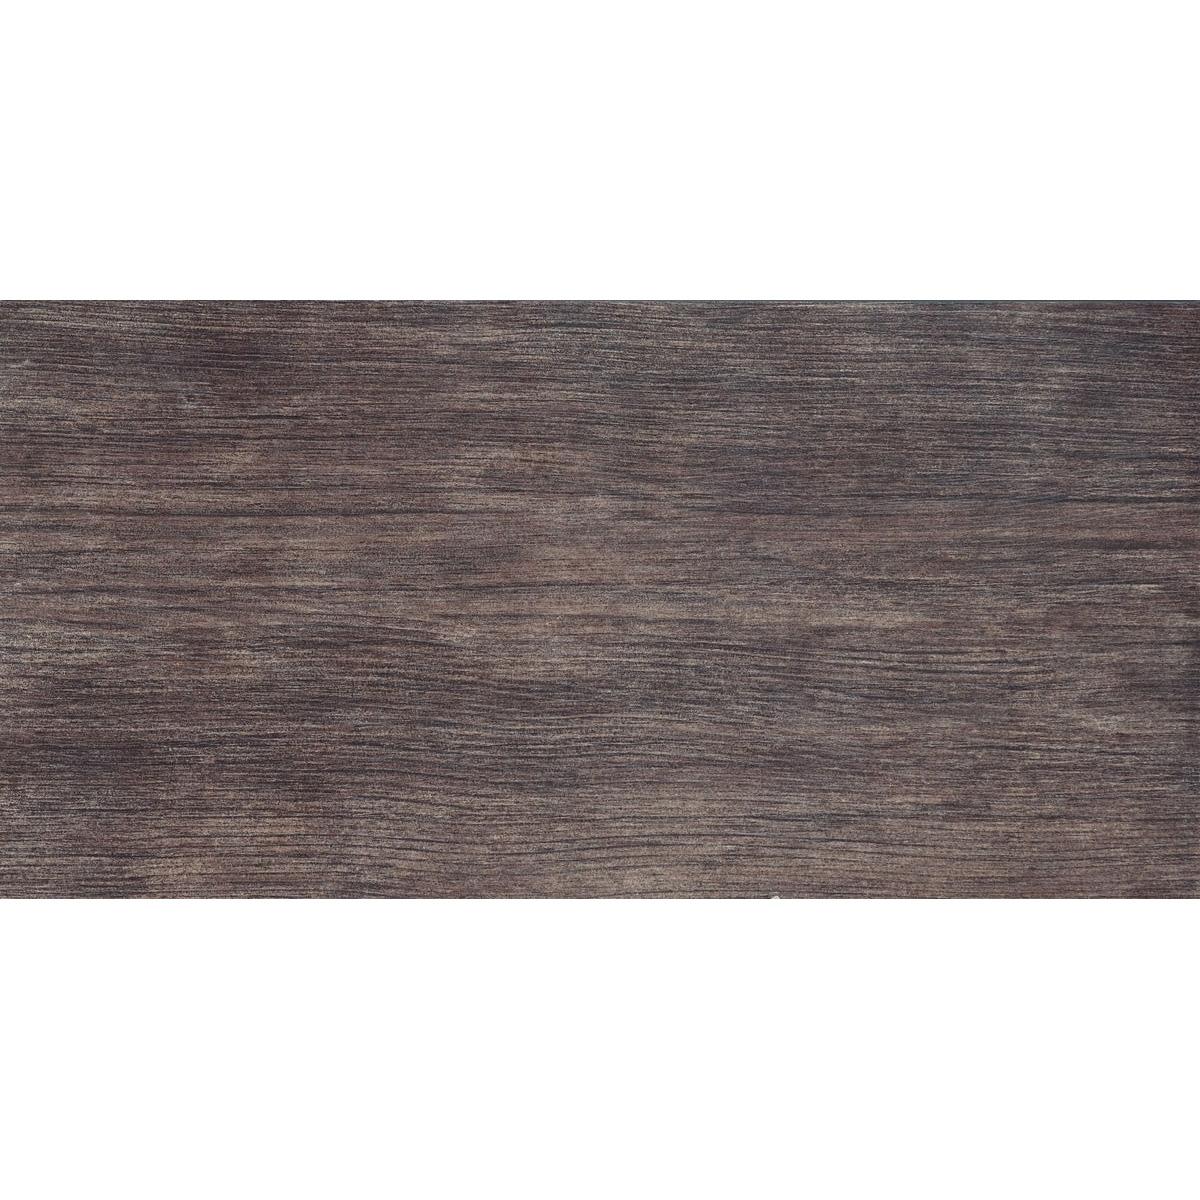 Brown   30x60 (znxpt6r) изображение 2